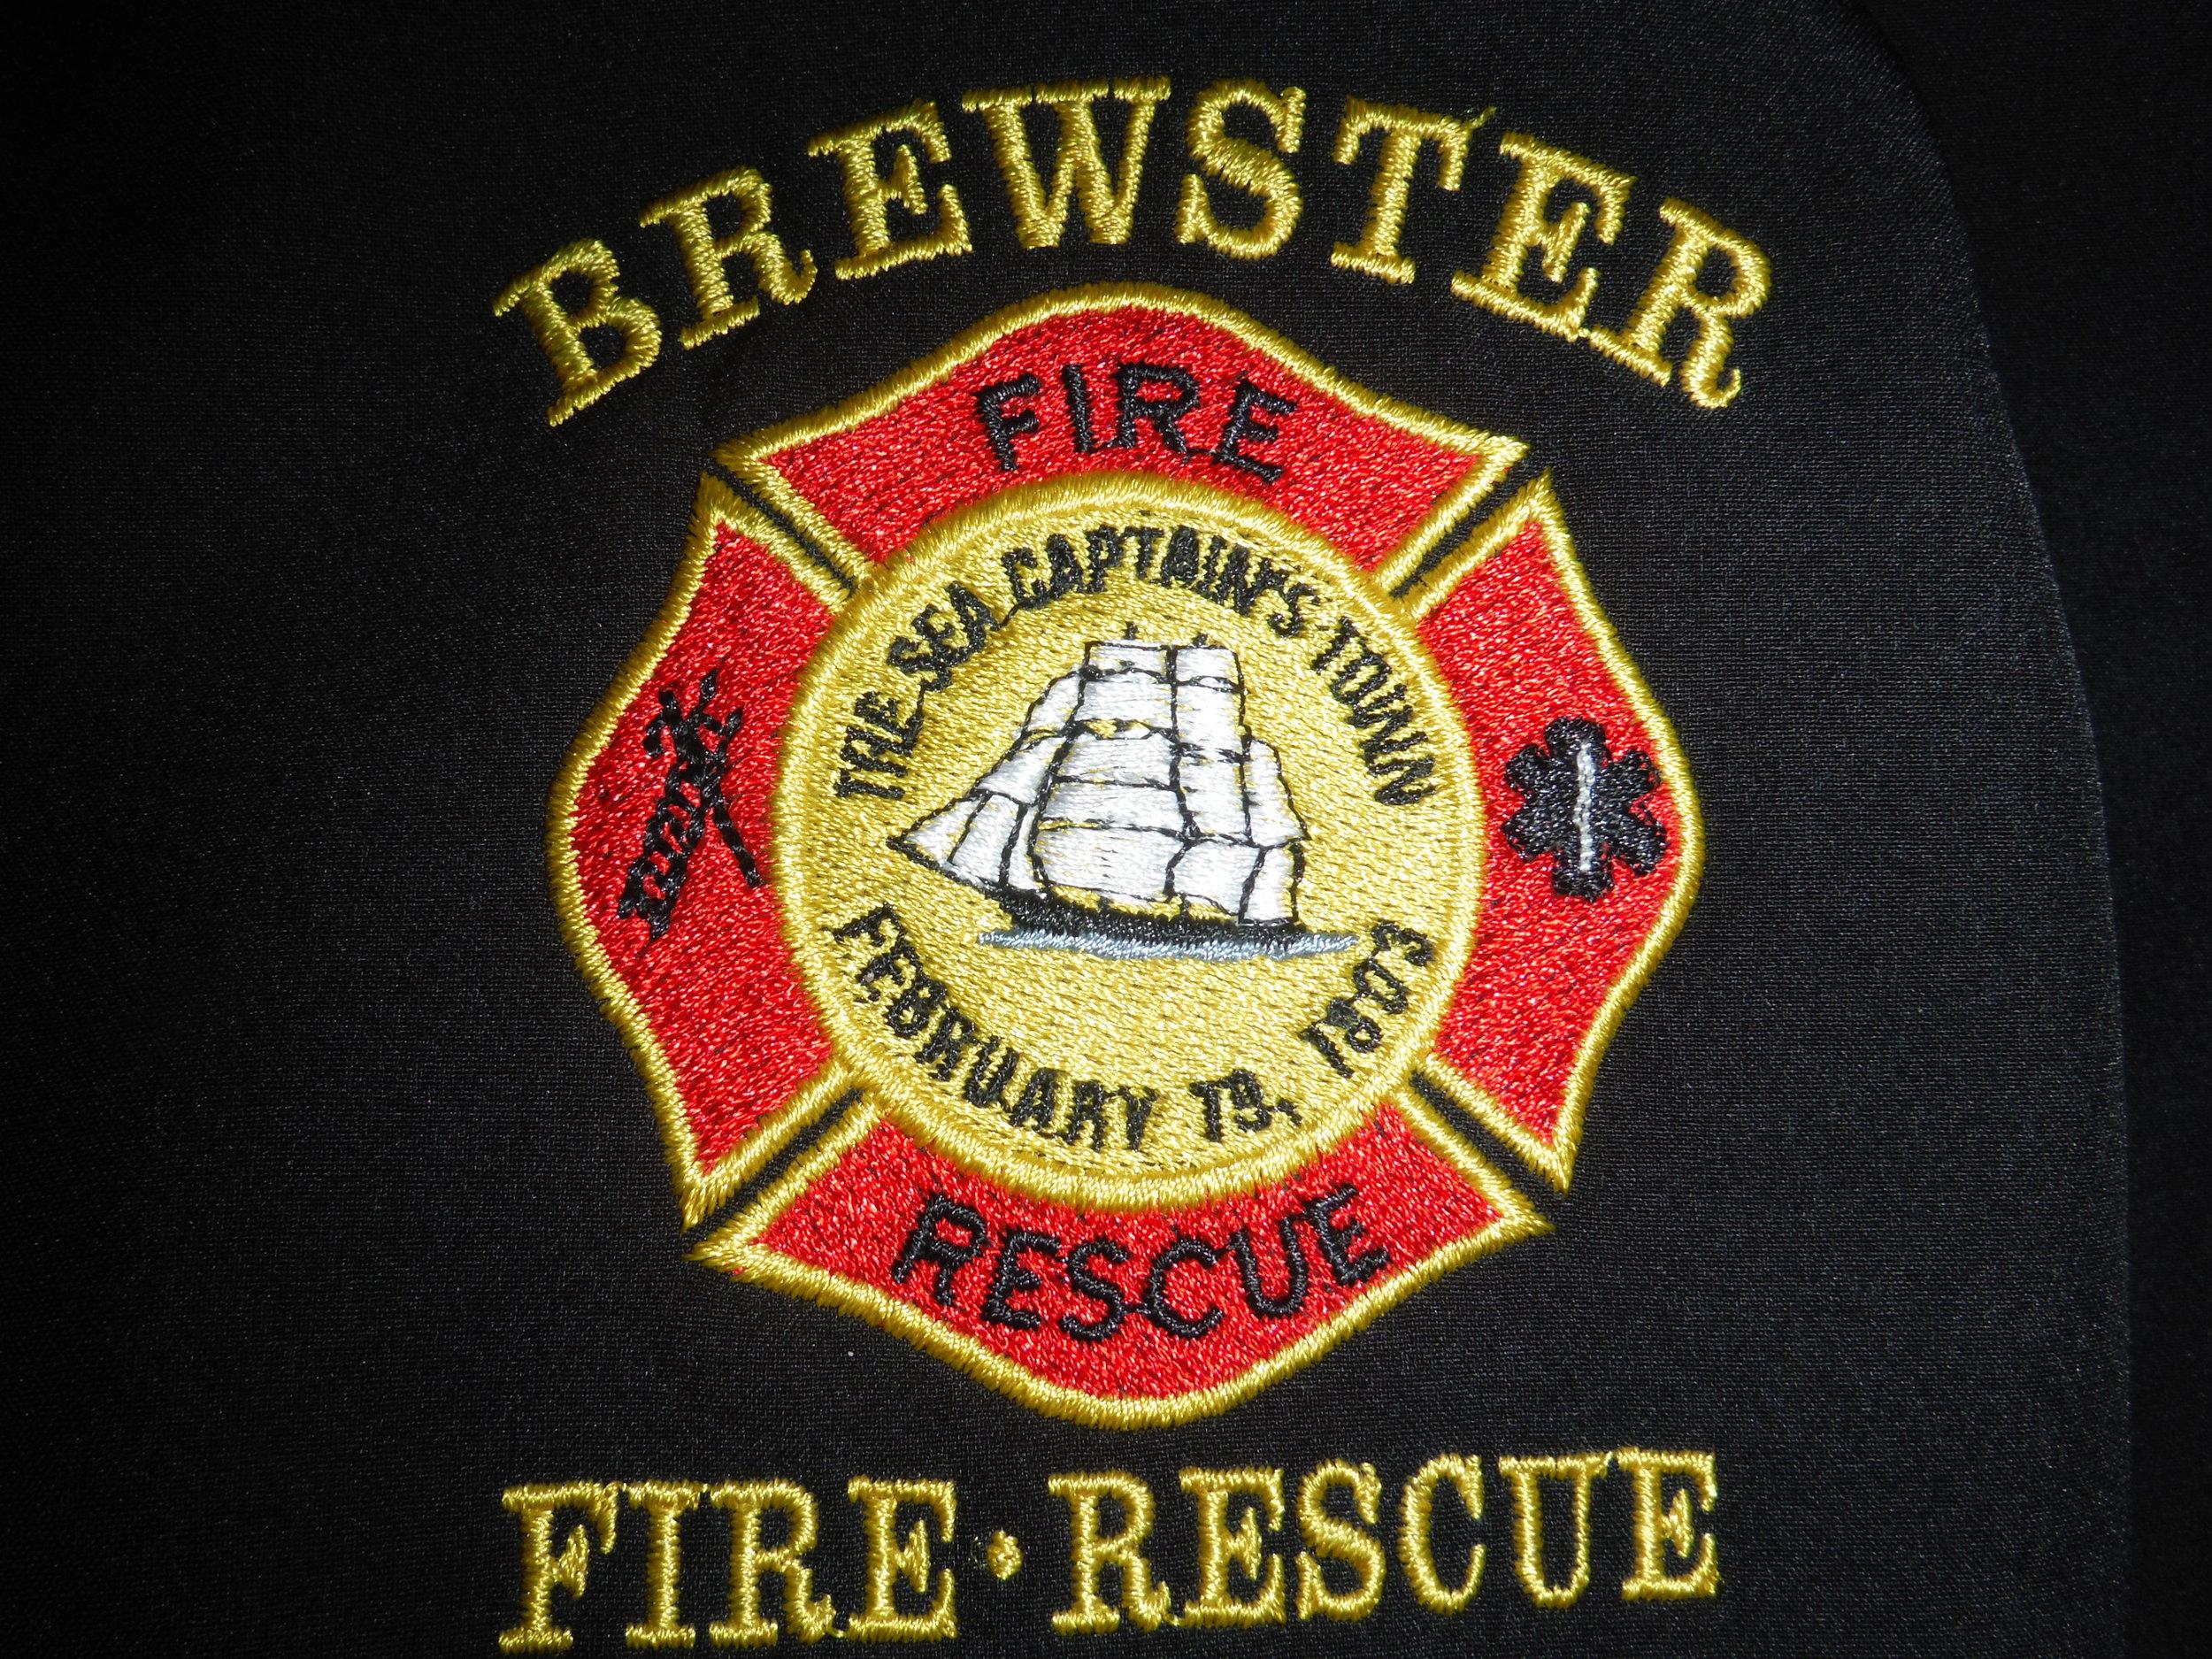 Brewster FD 003.JPG